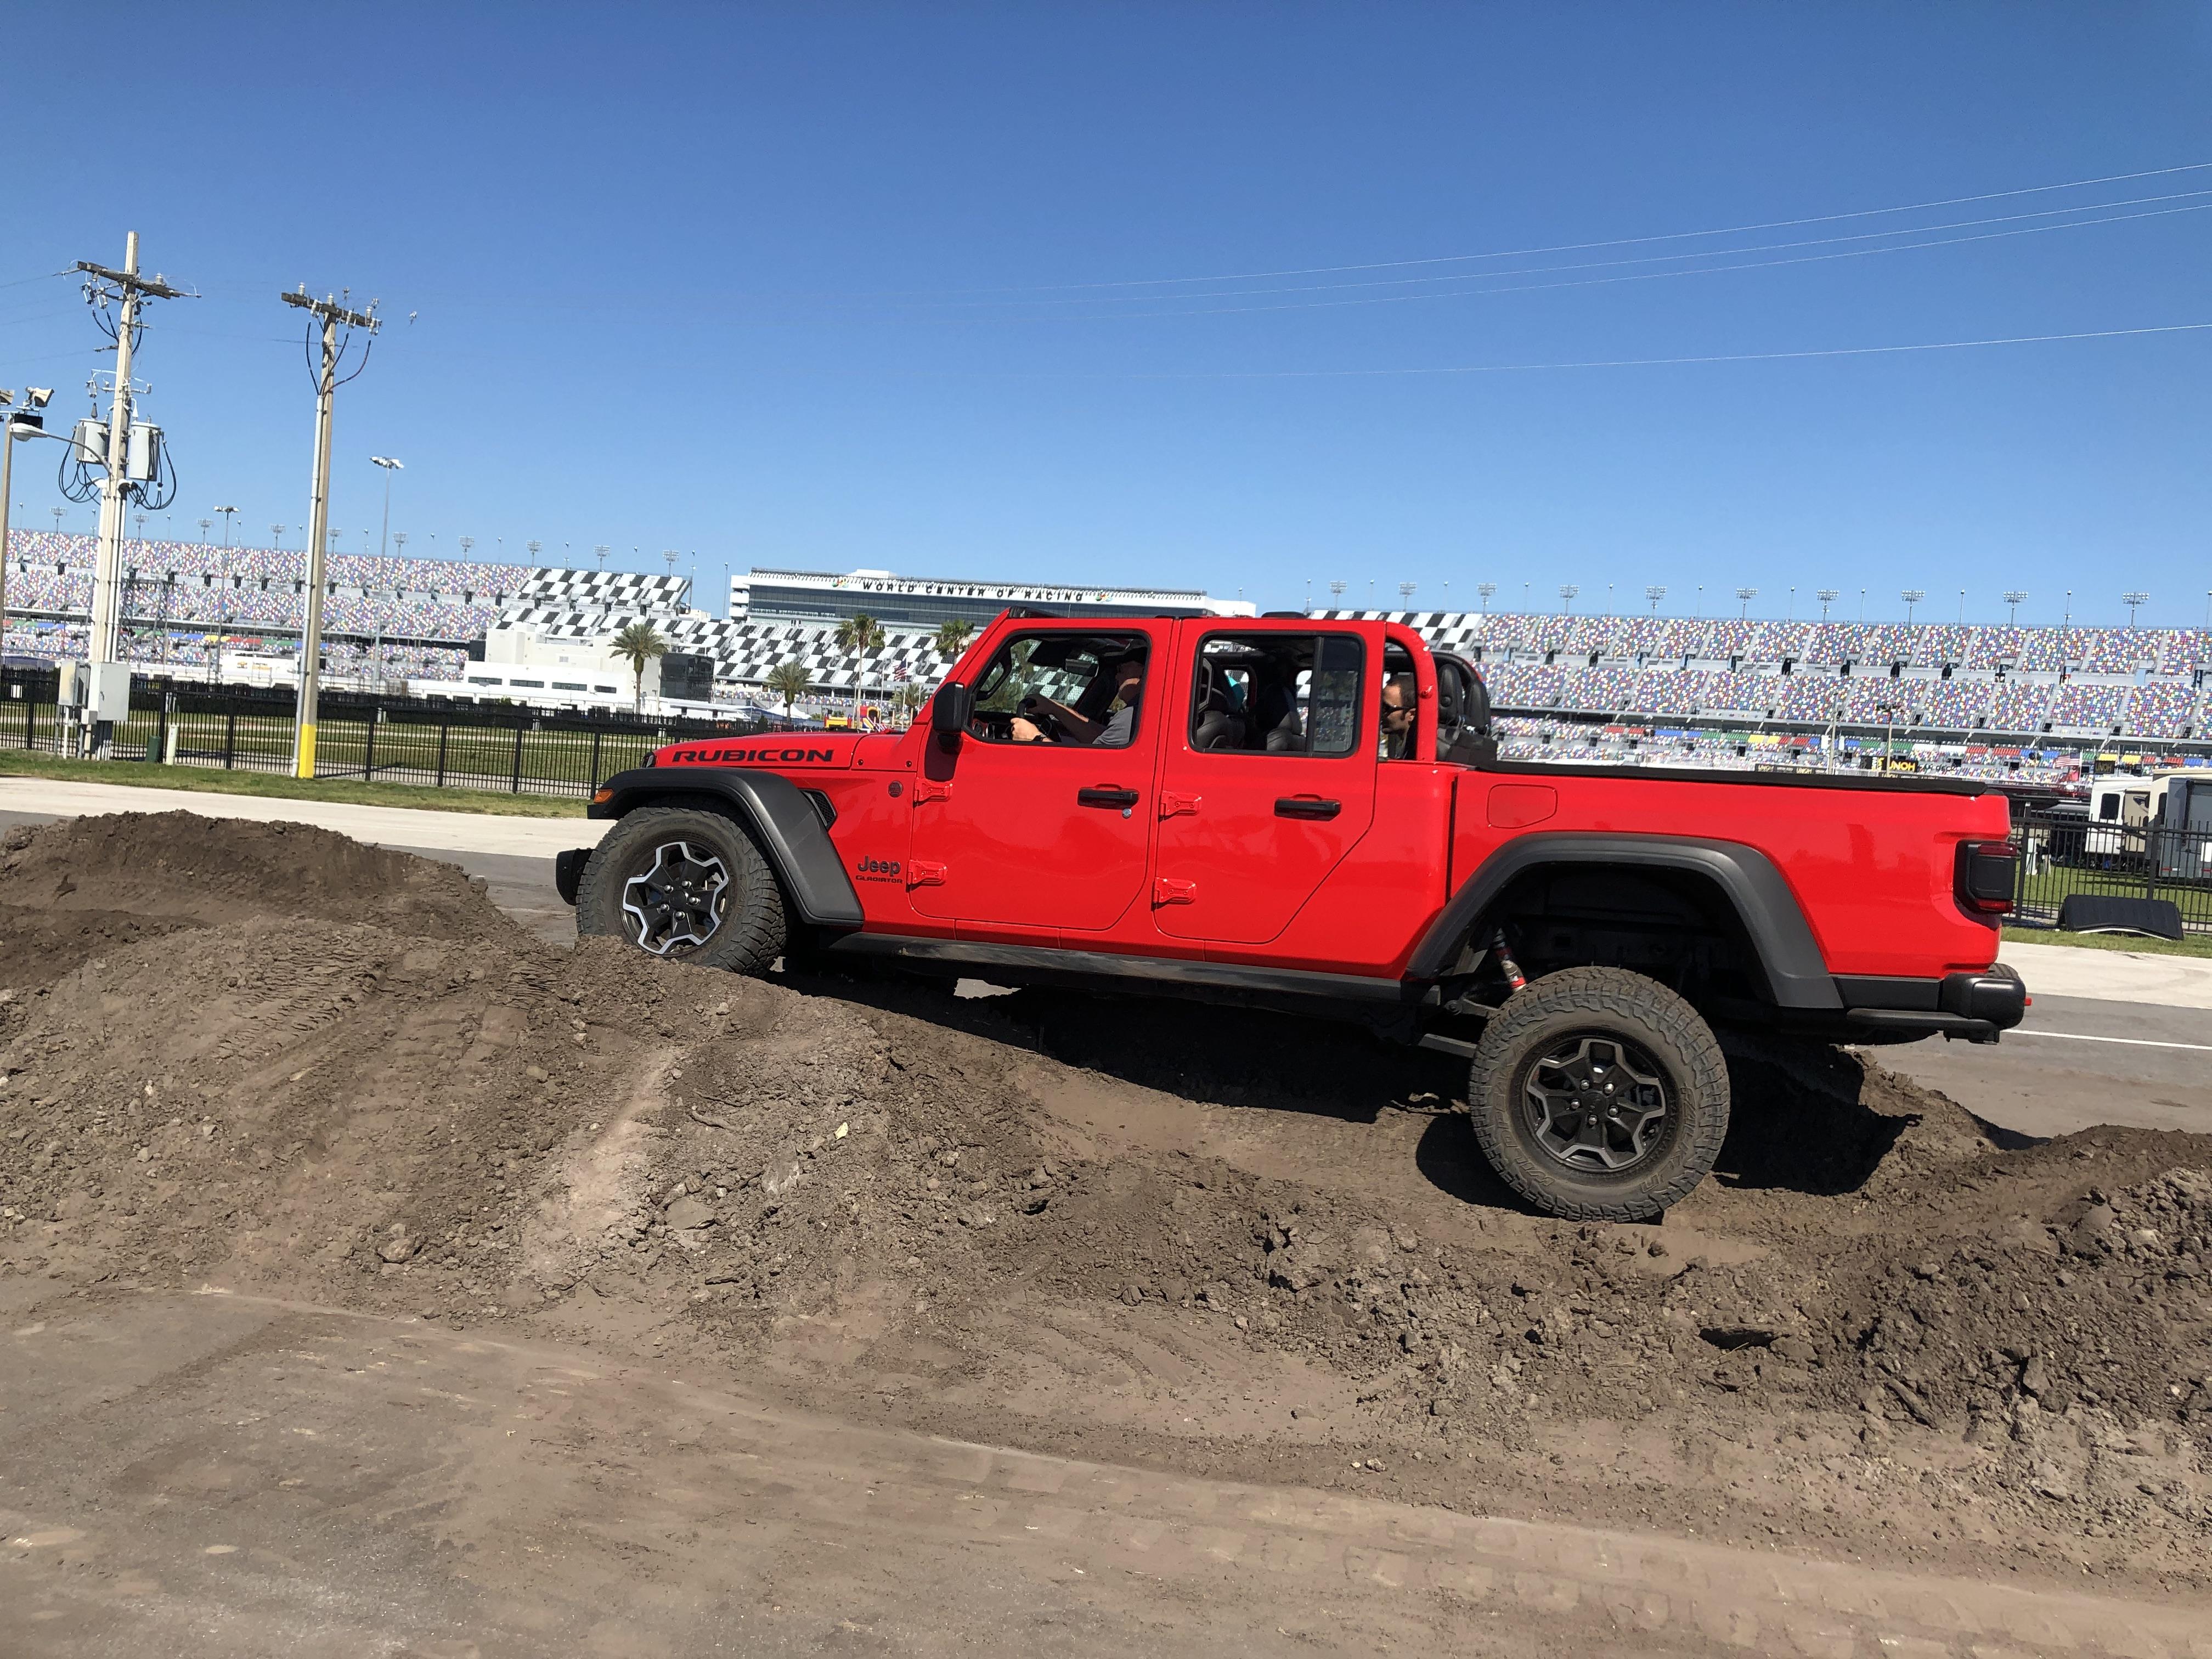 Jeep Off Road Course Event Management Logistics